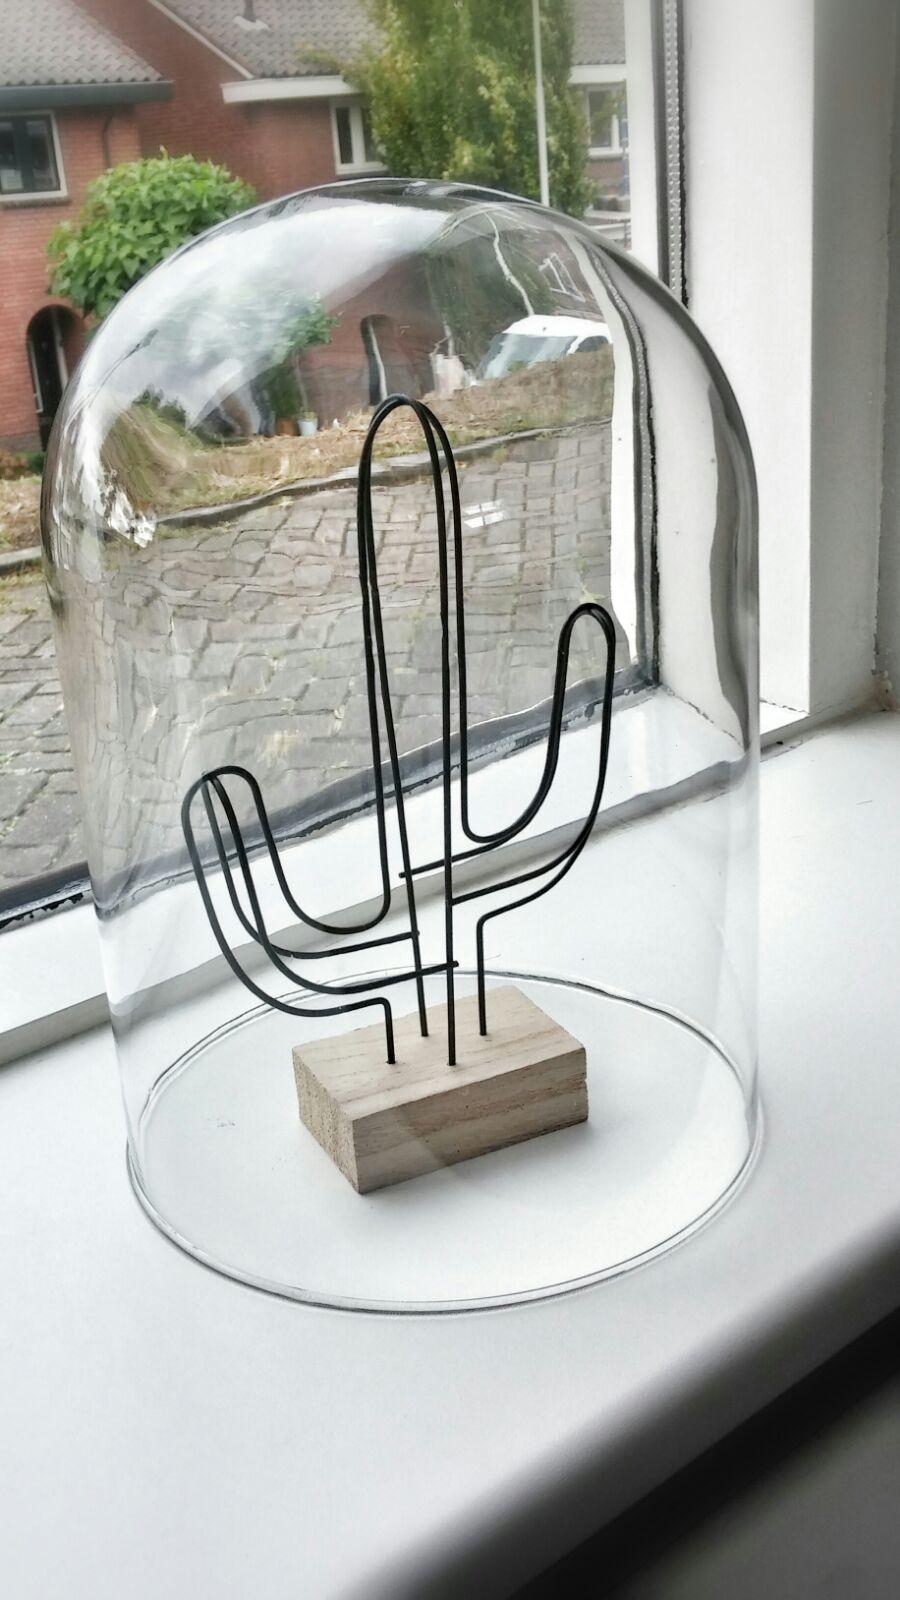 woonkamer interieurstyling industrieel stoer cactus stolp glas.jpg